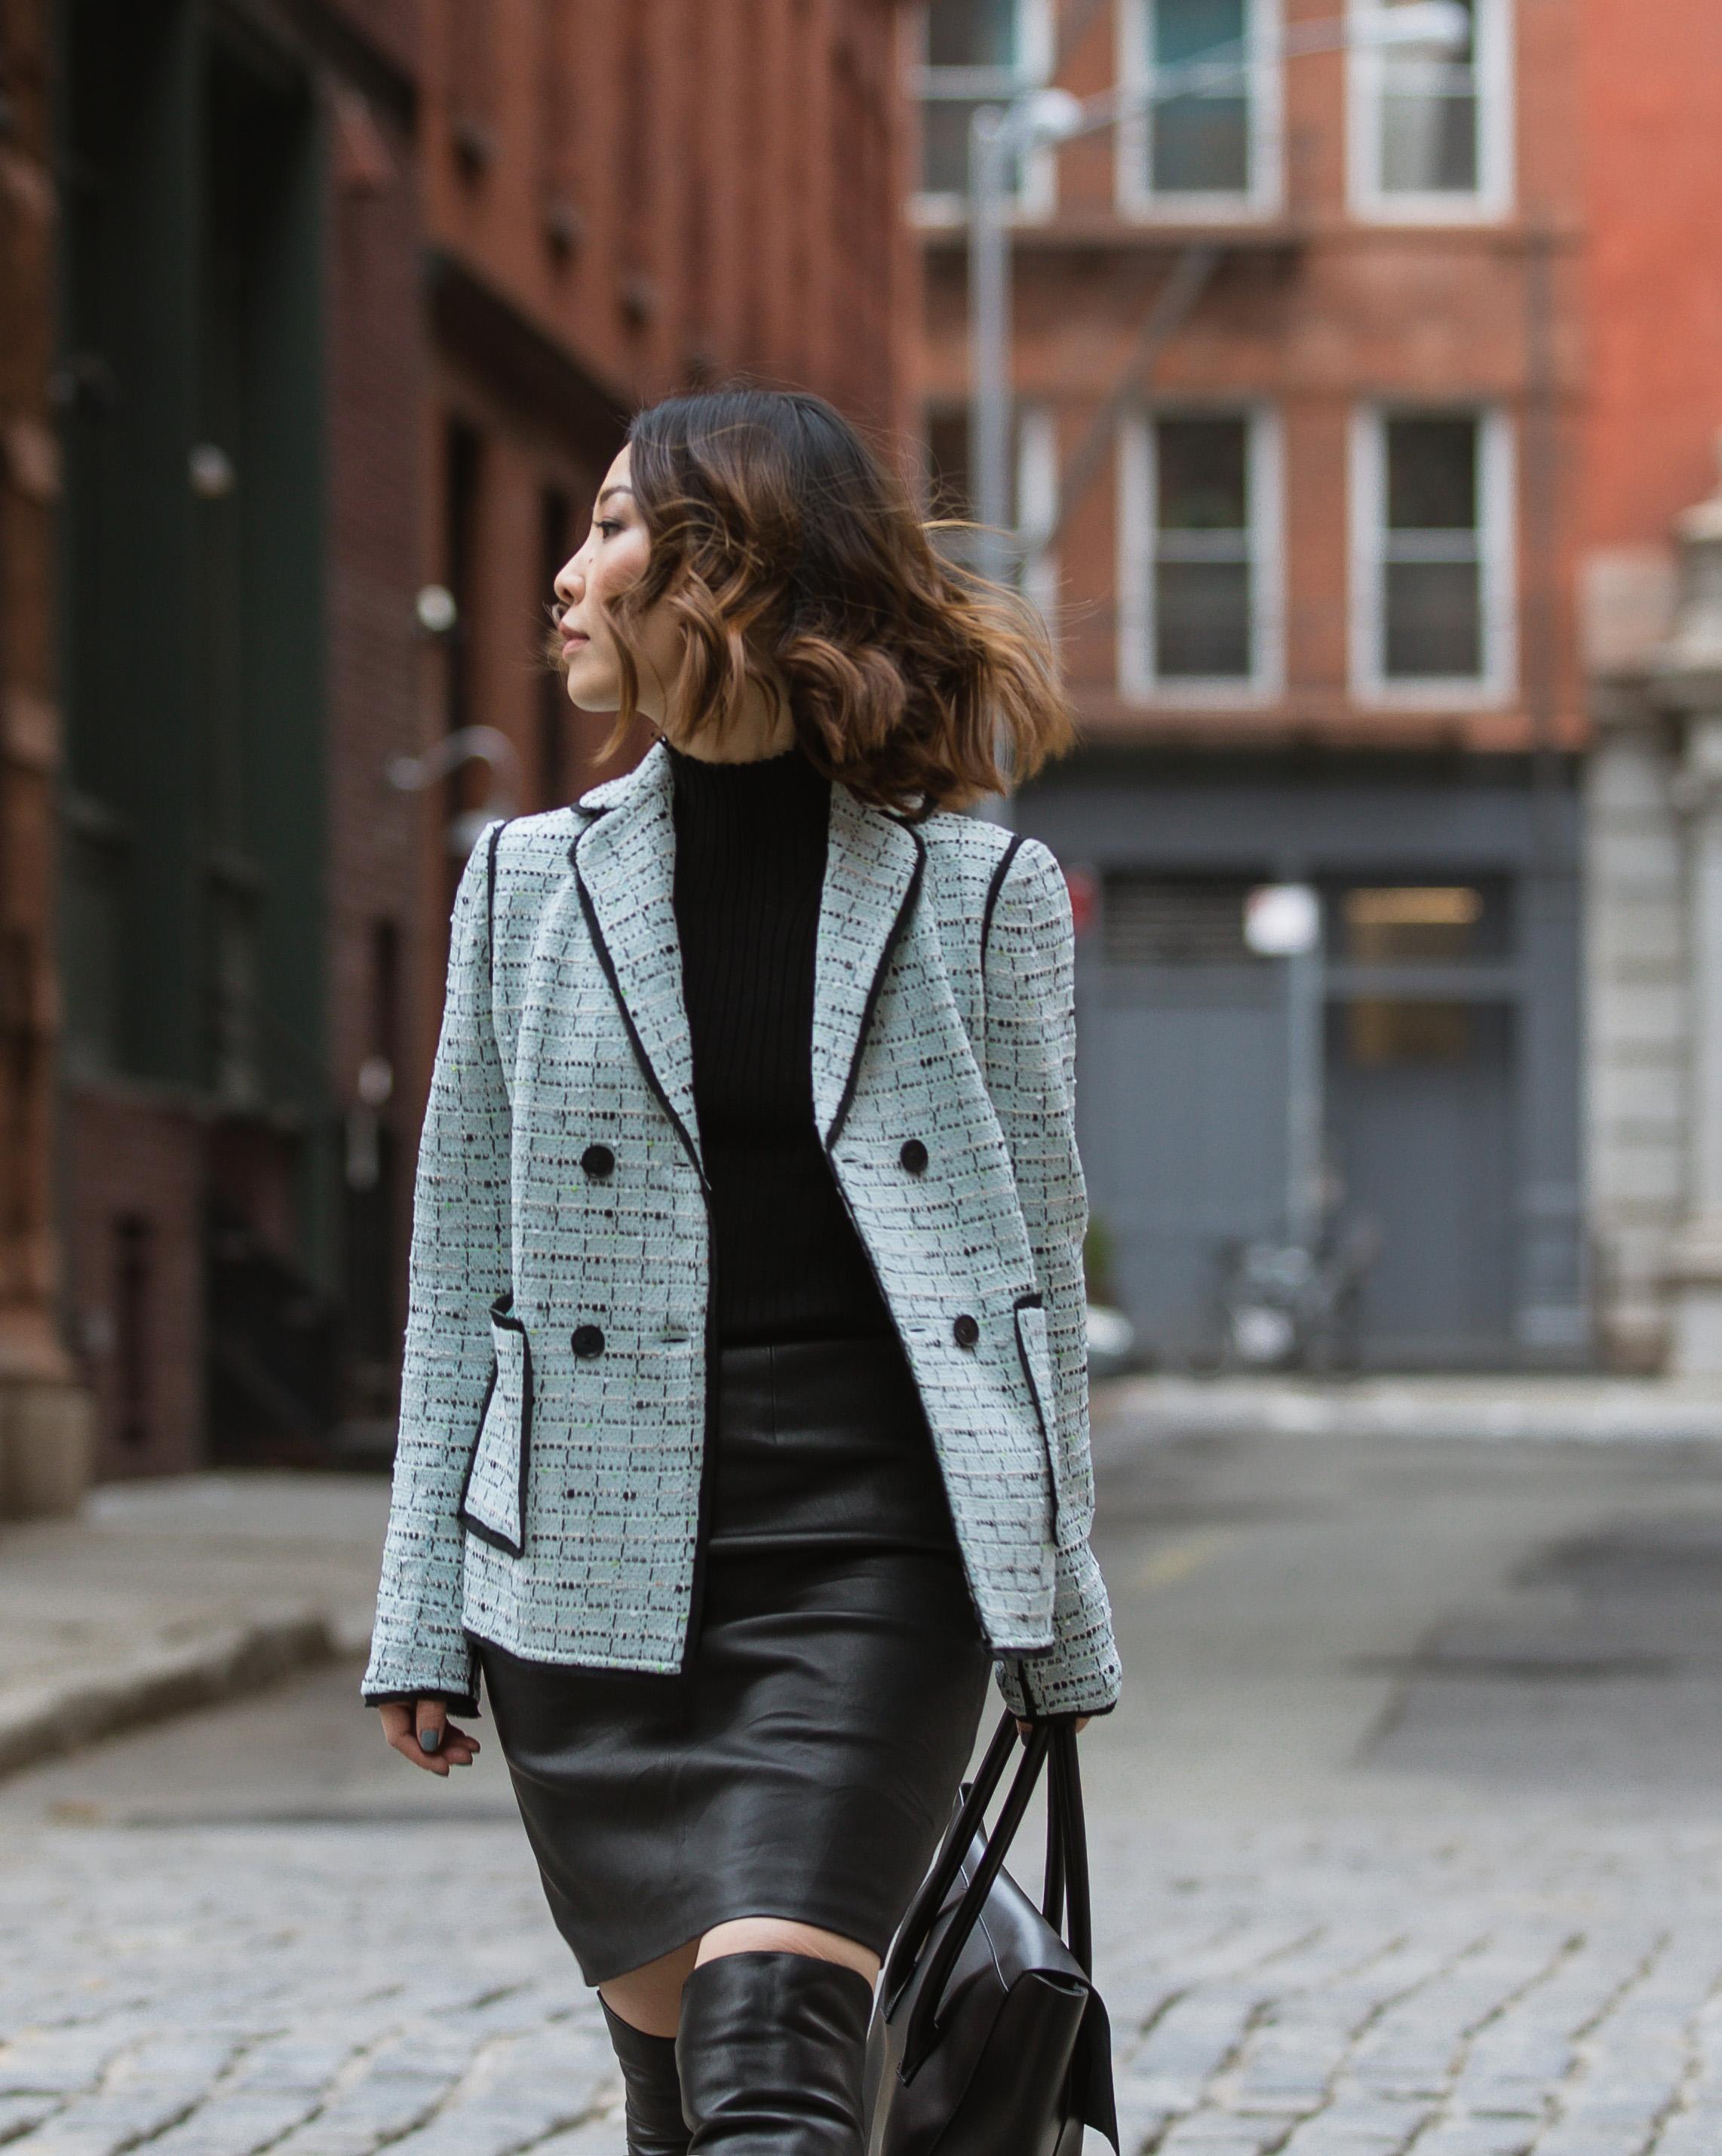 st john knits adriana multi tweed jacket nyc.JPG